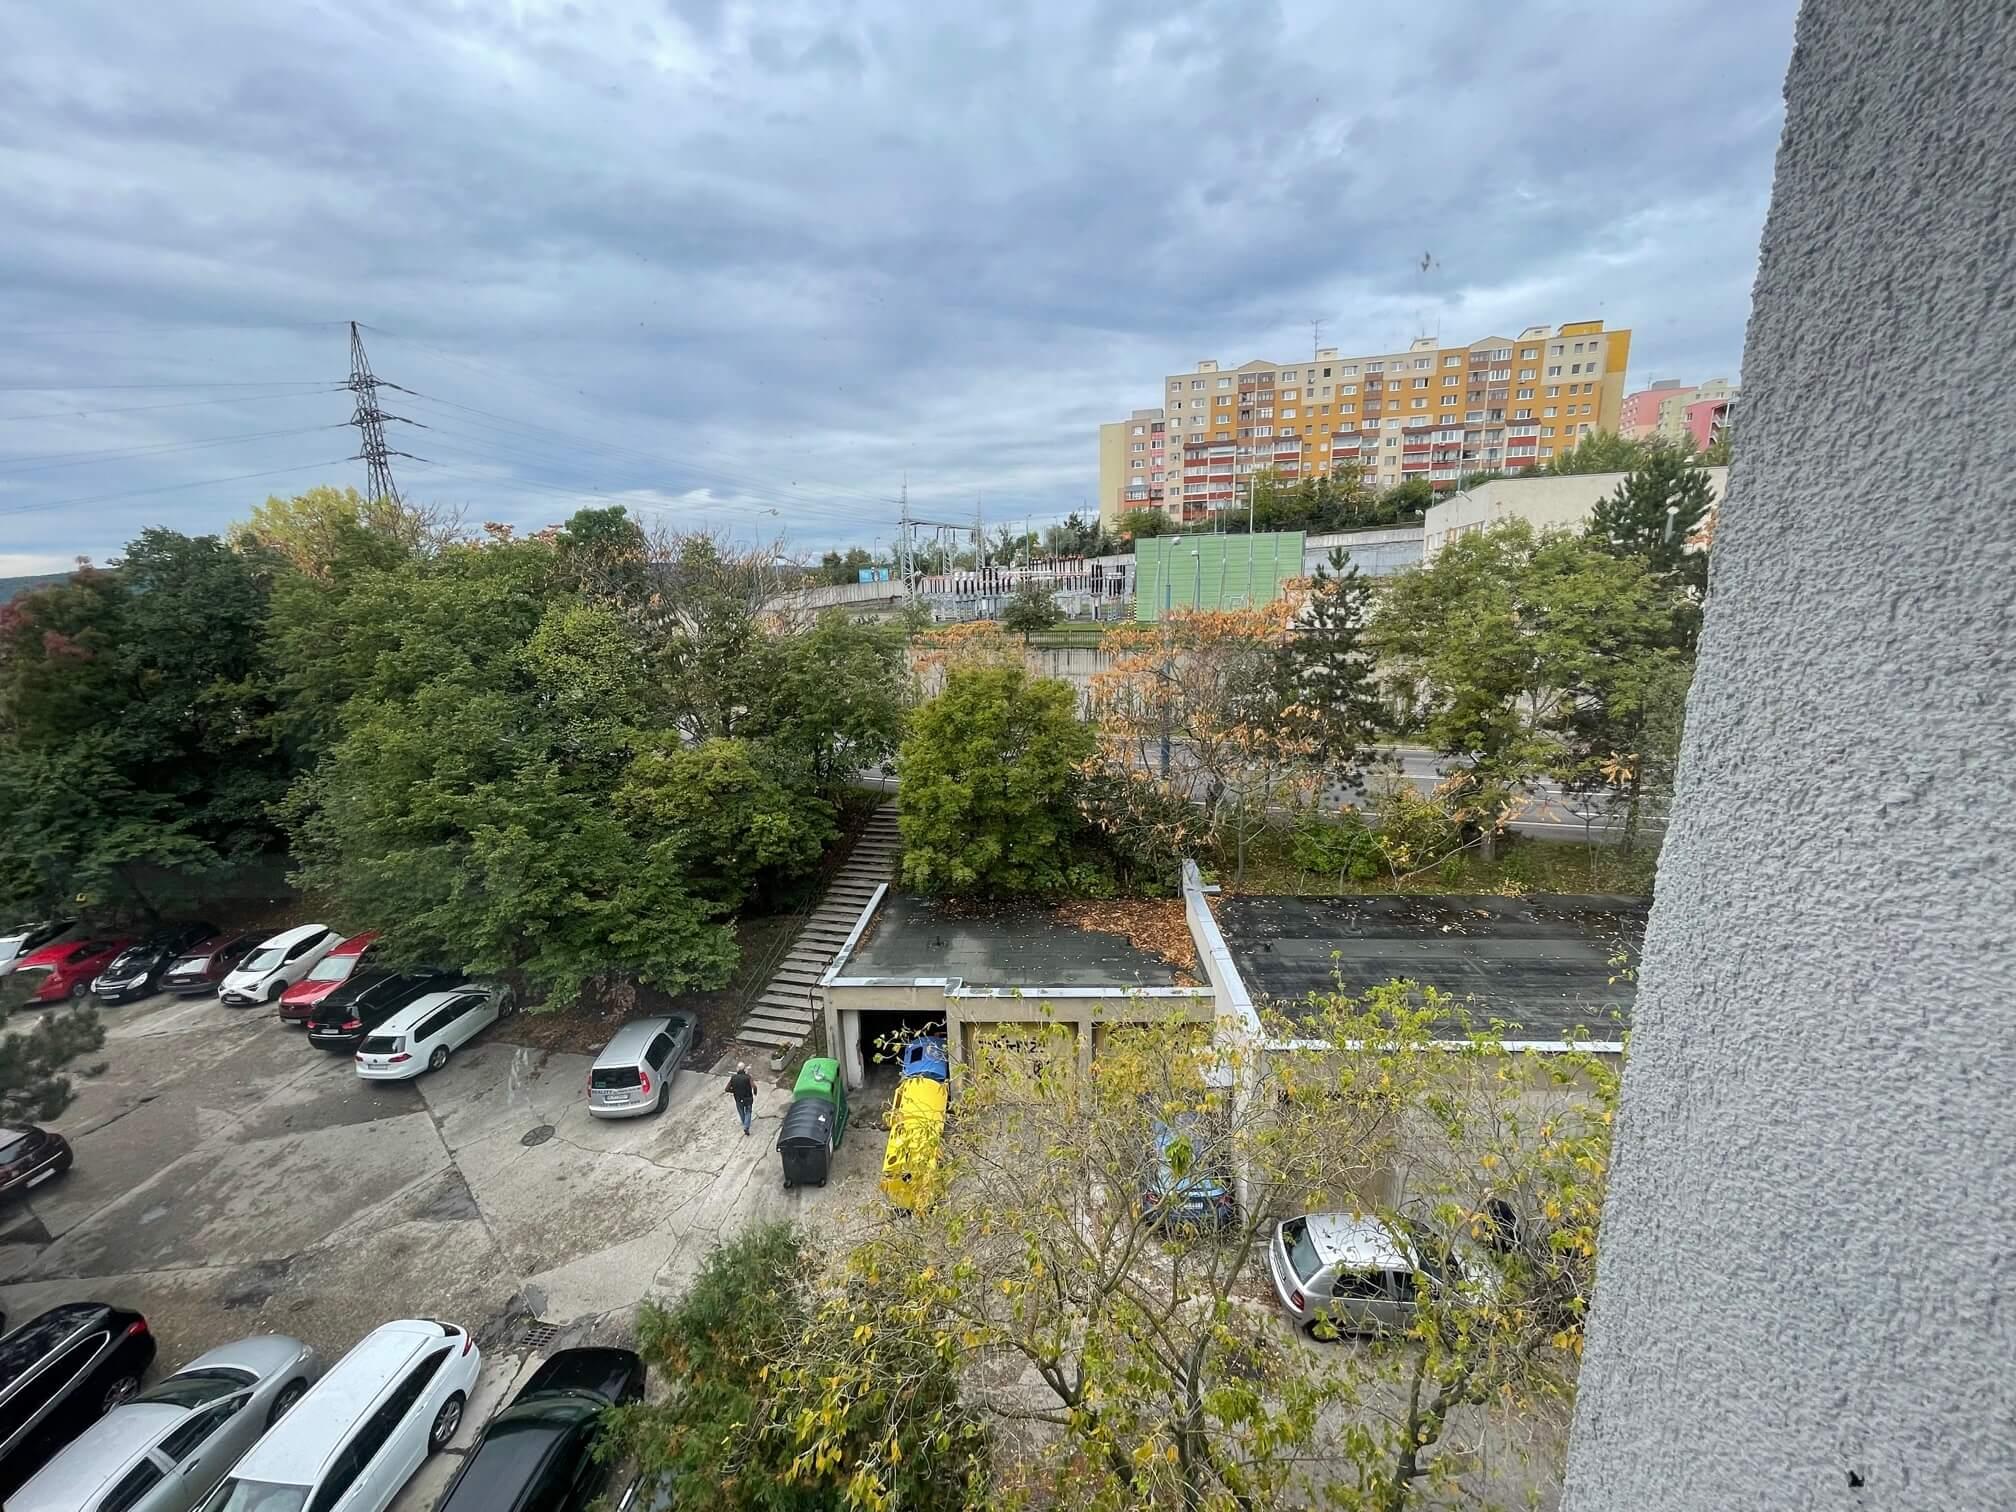 Exkluzívne na prenájom 3 izbový byt, 83m2, 2x loggia 4,5m2, Karolovka, Janotová 8-17